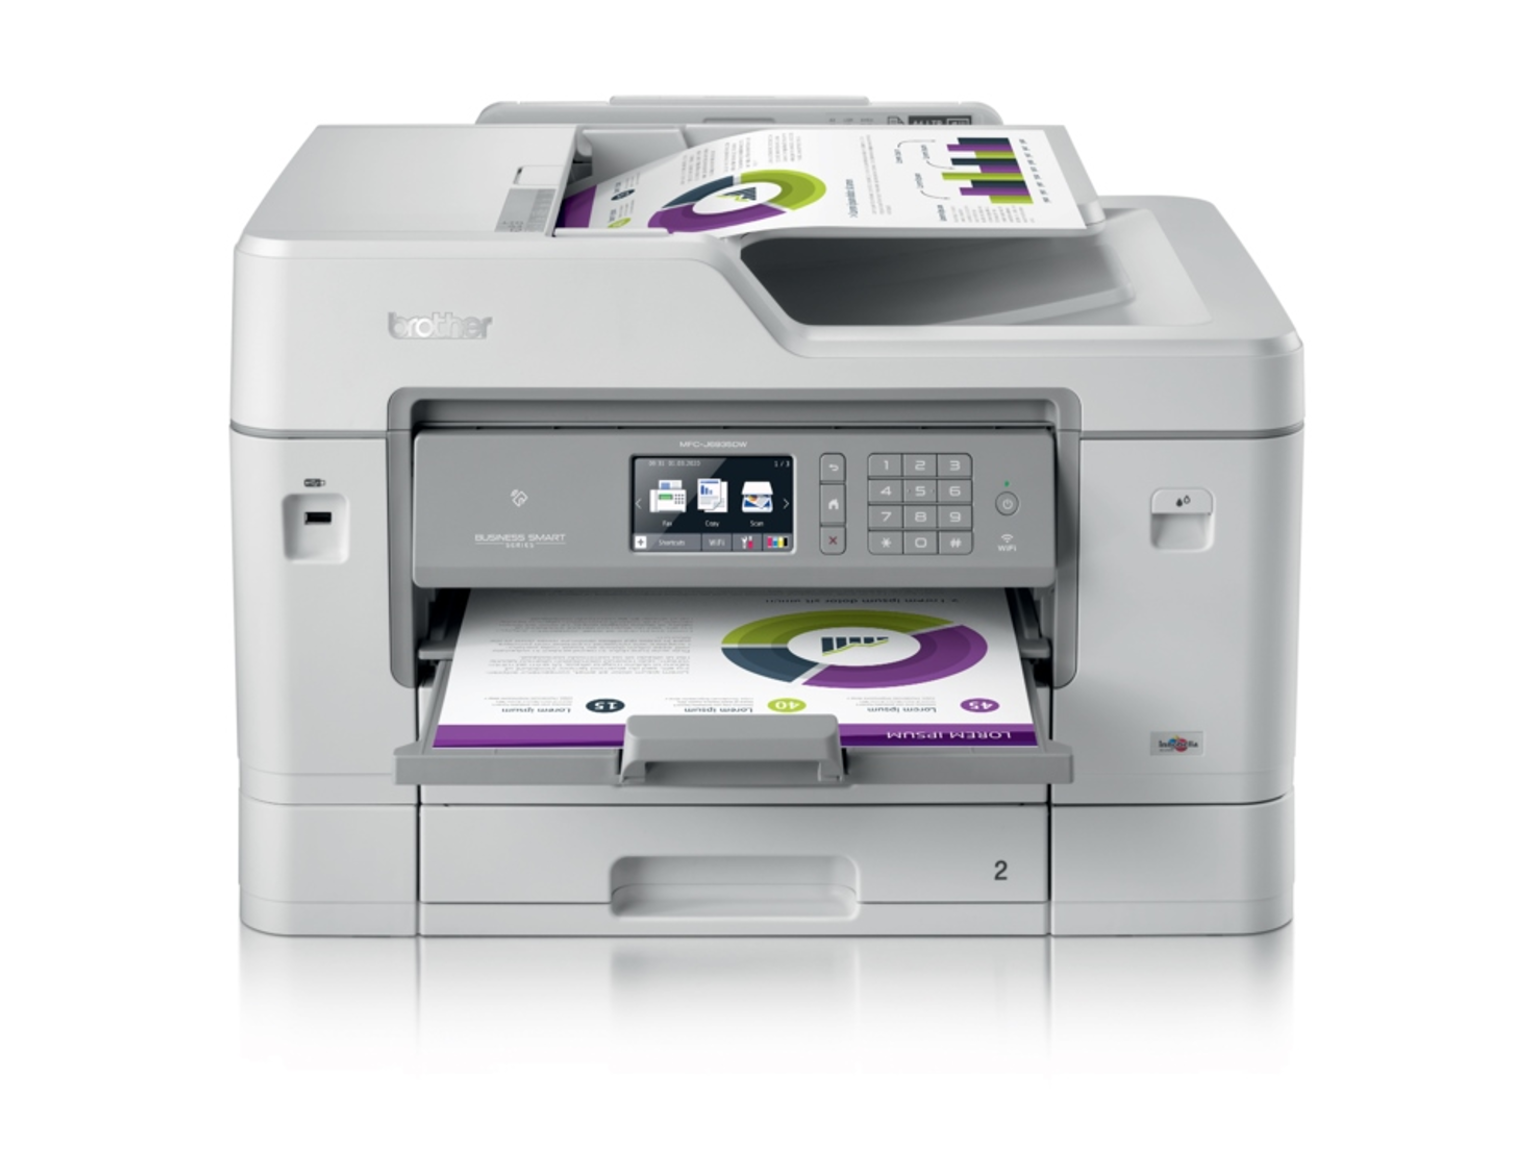 Impresora multifunción tinta profesional hasta A3 MFC-J6920DW